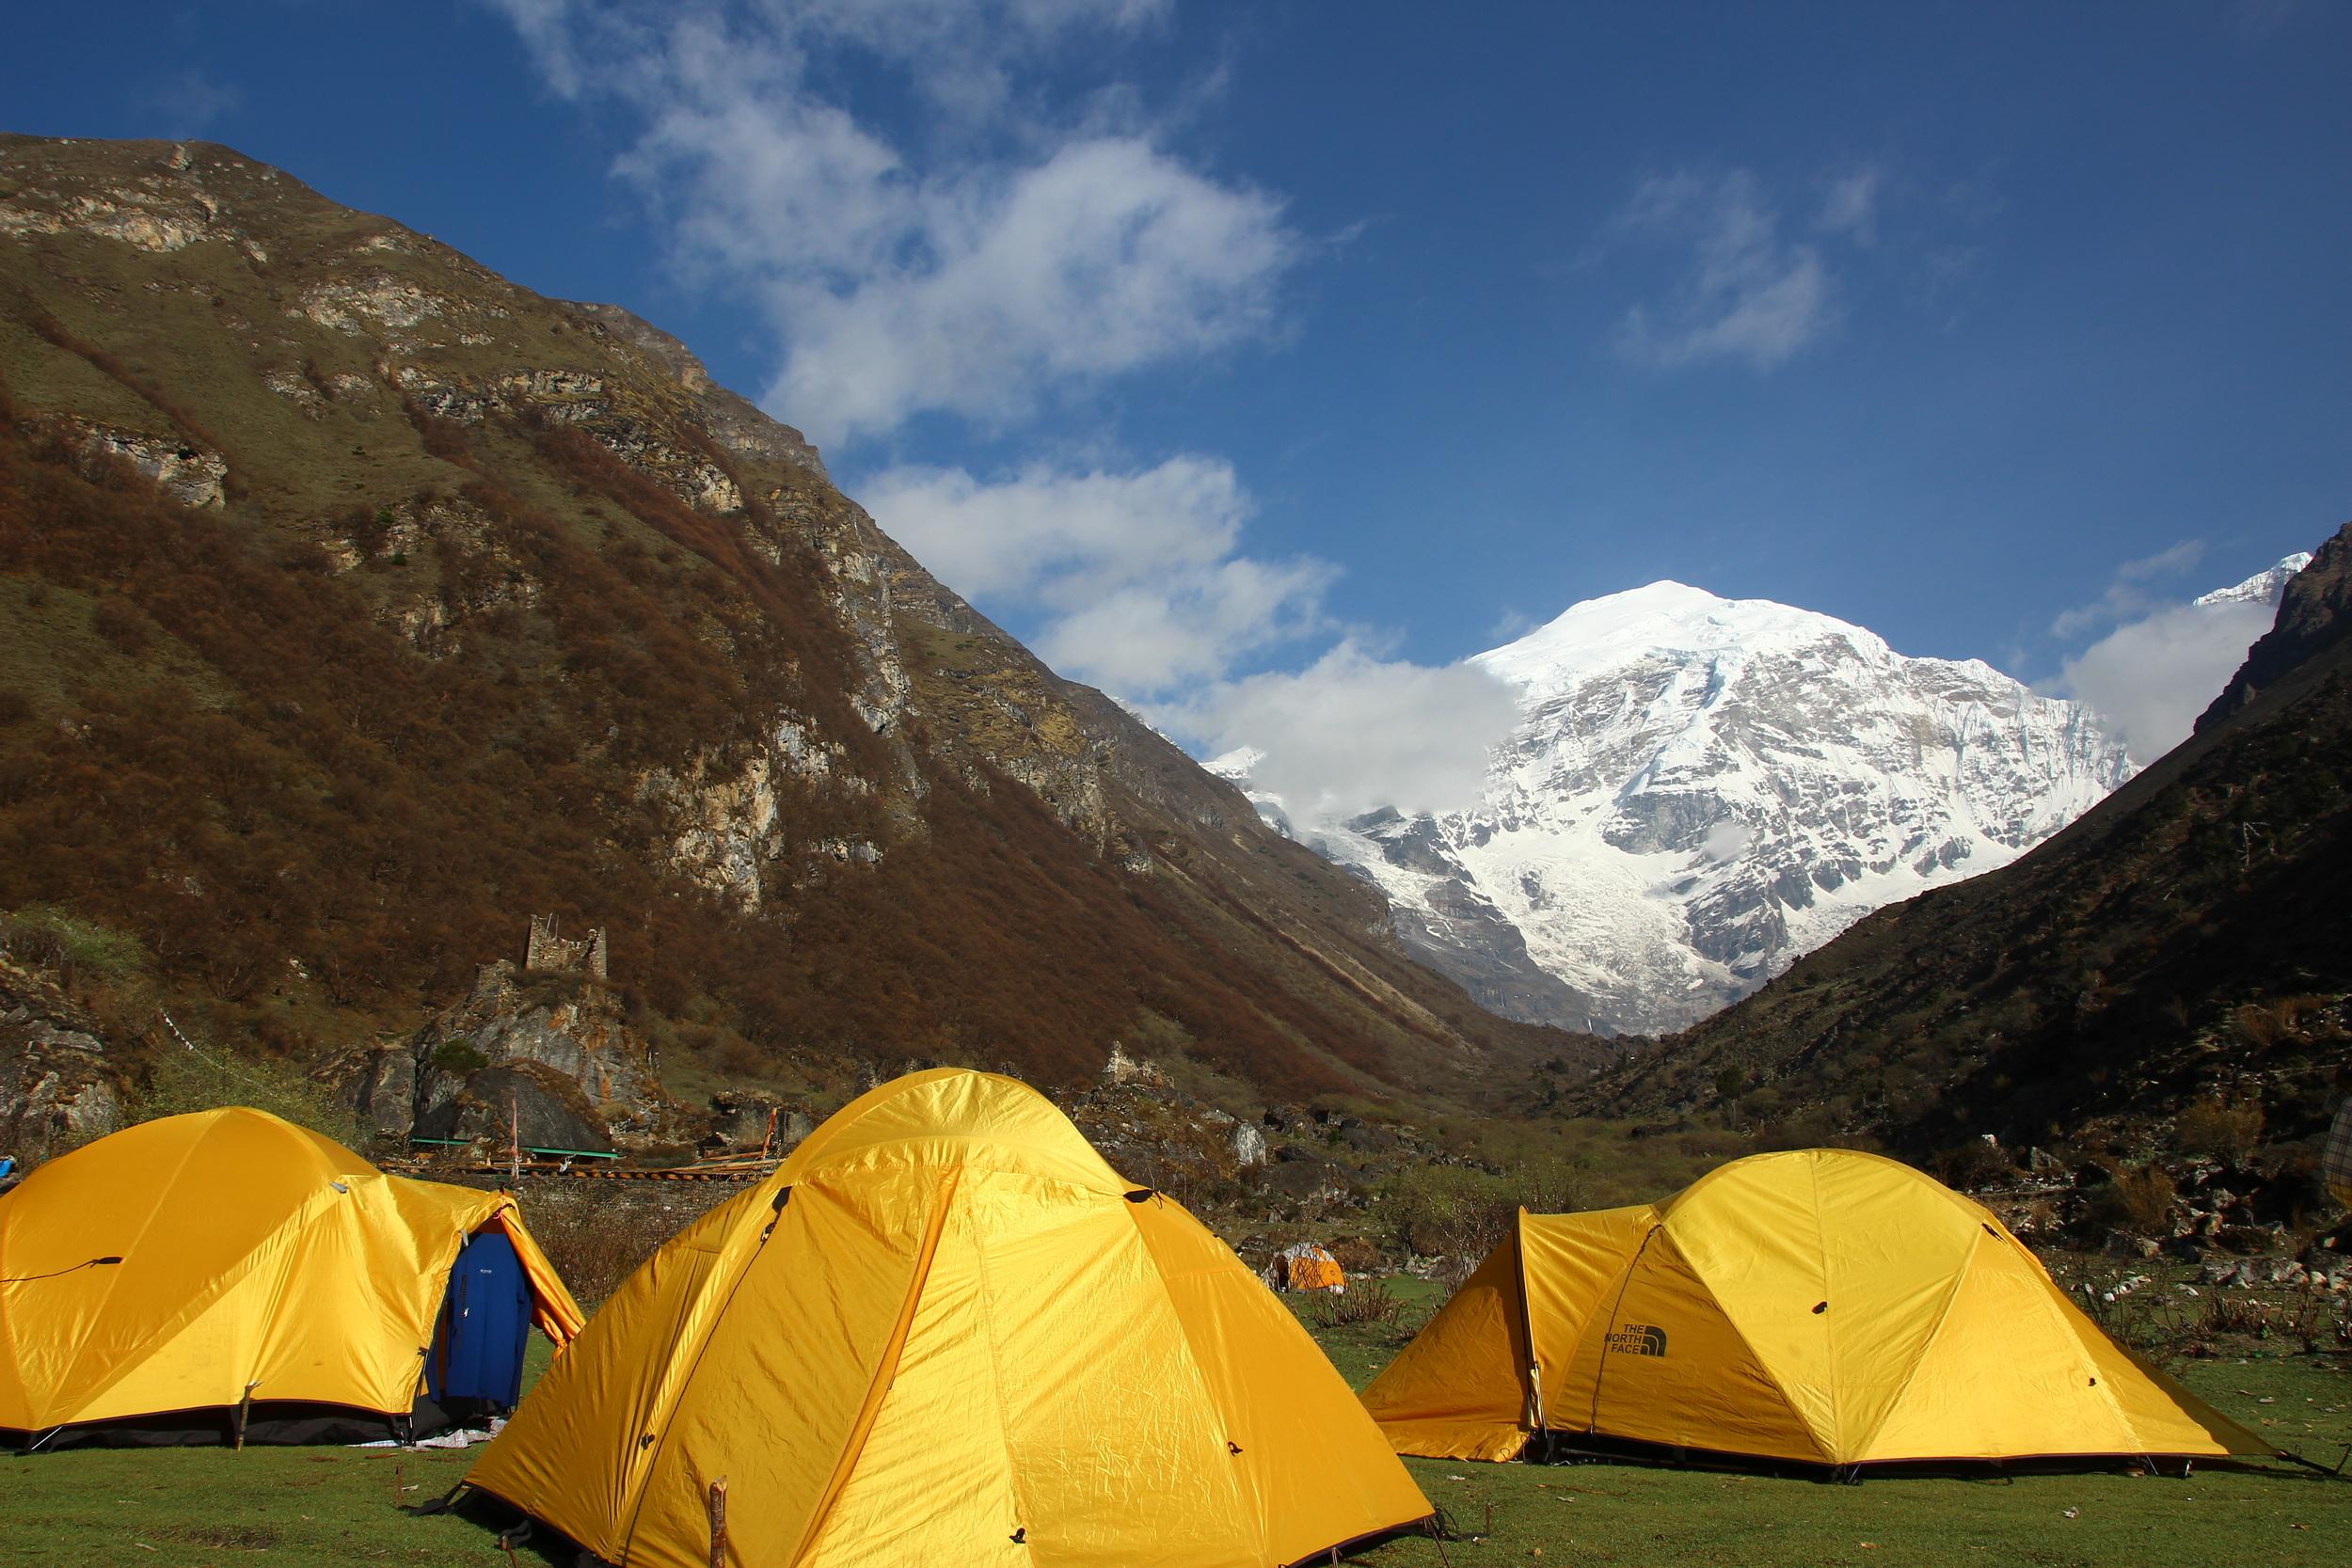 My tent....my world!!